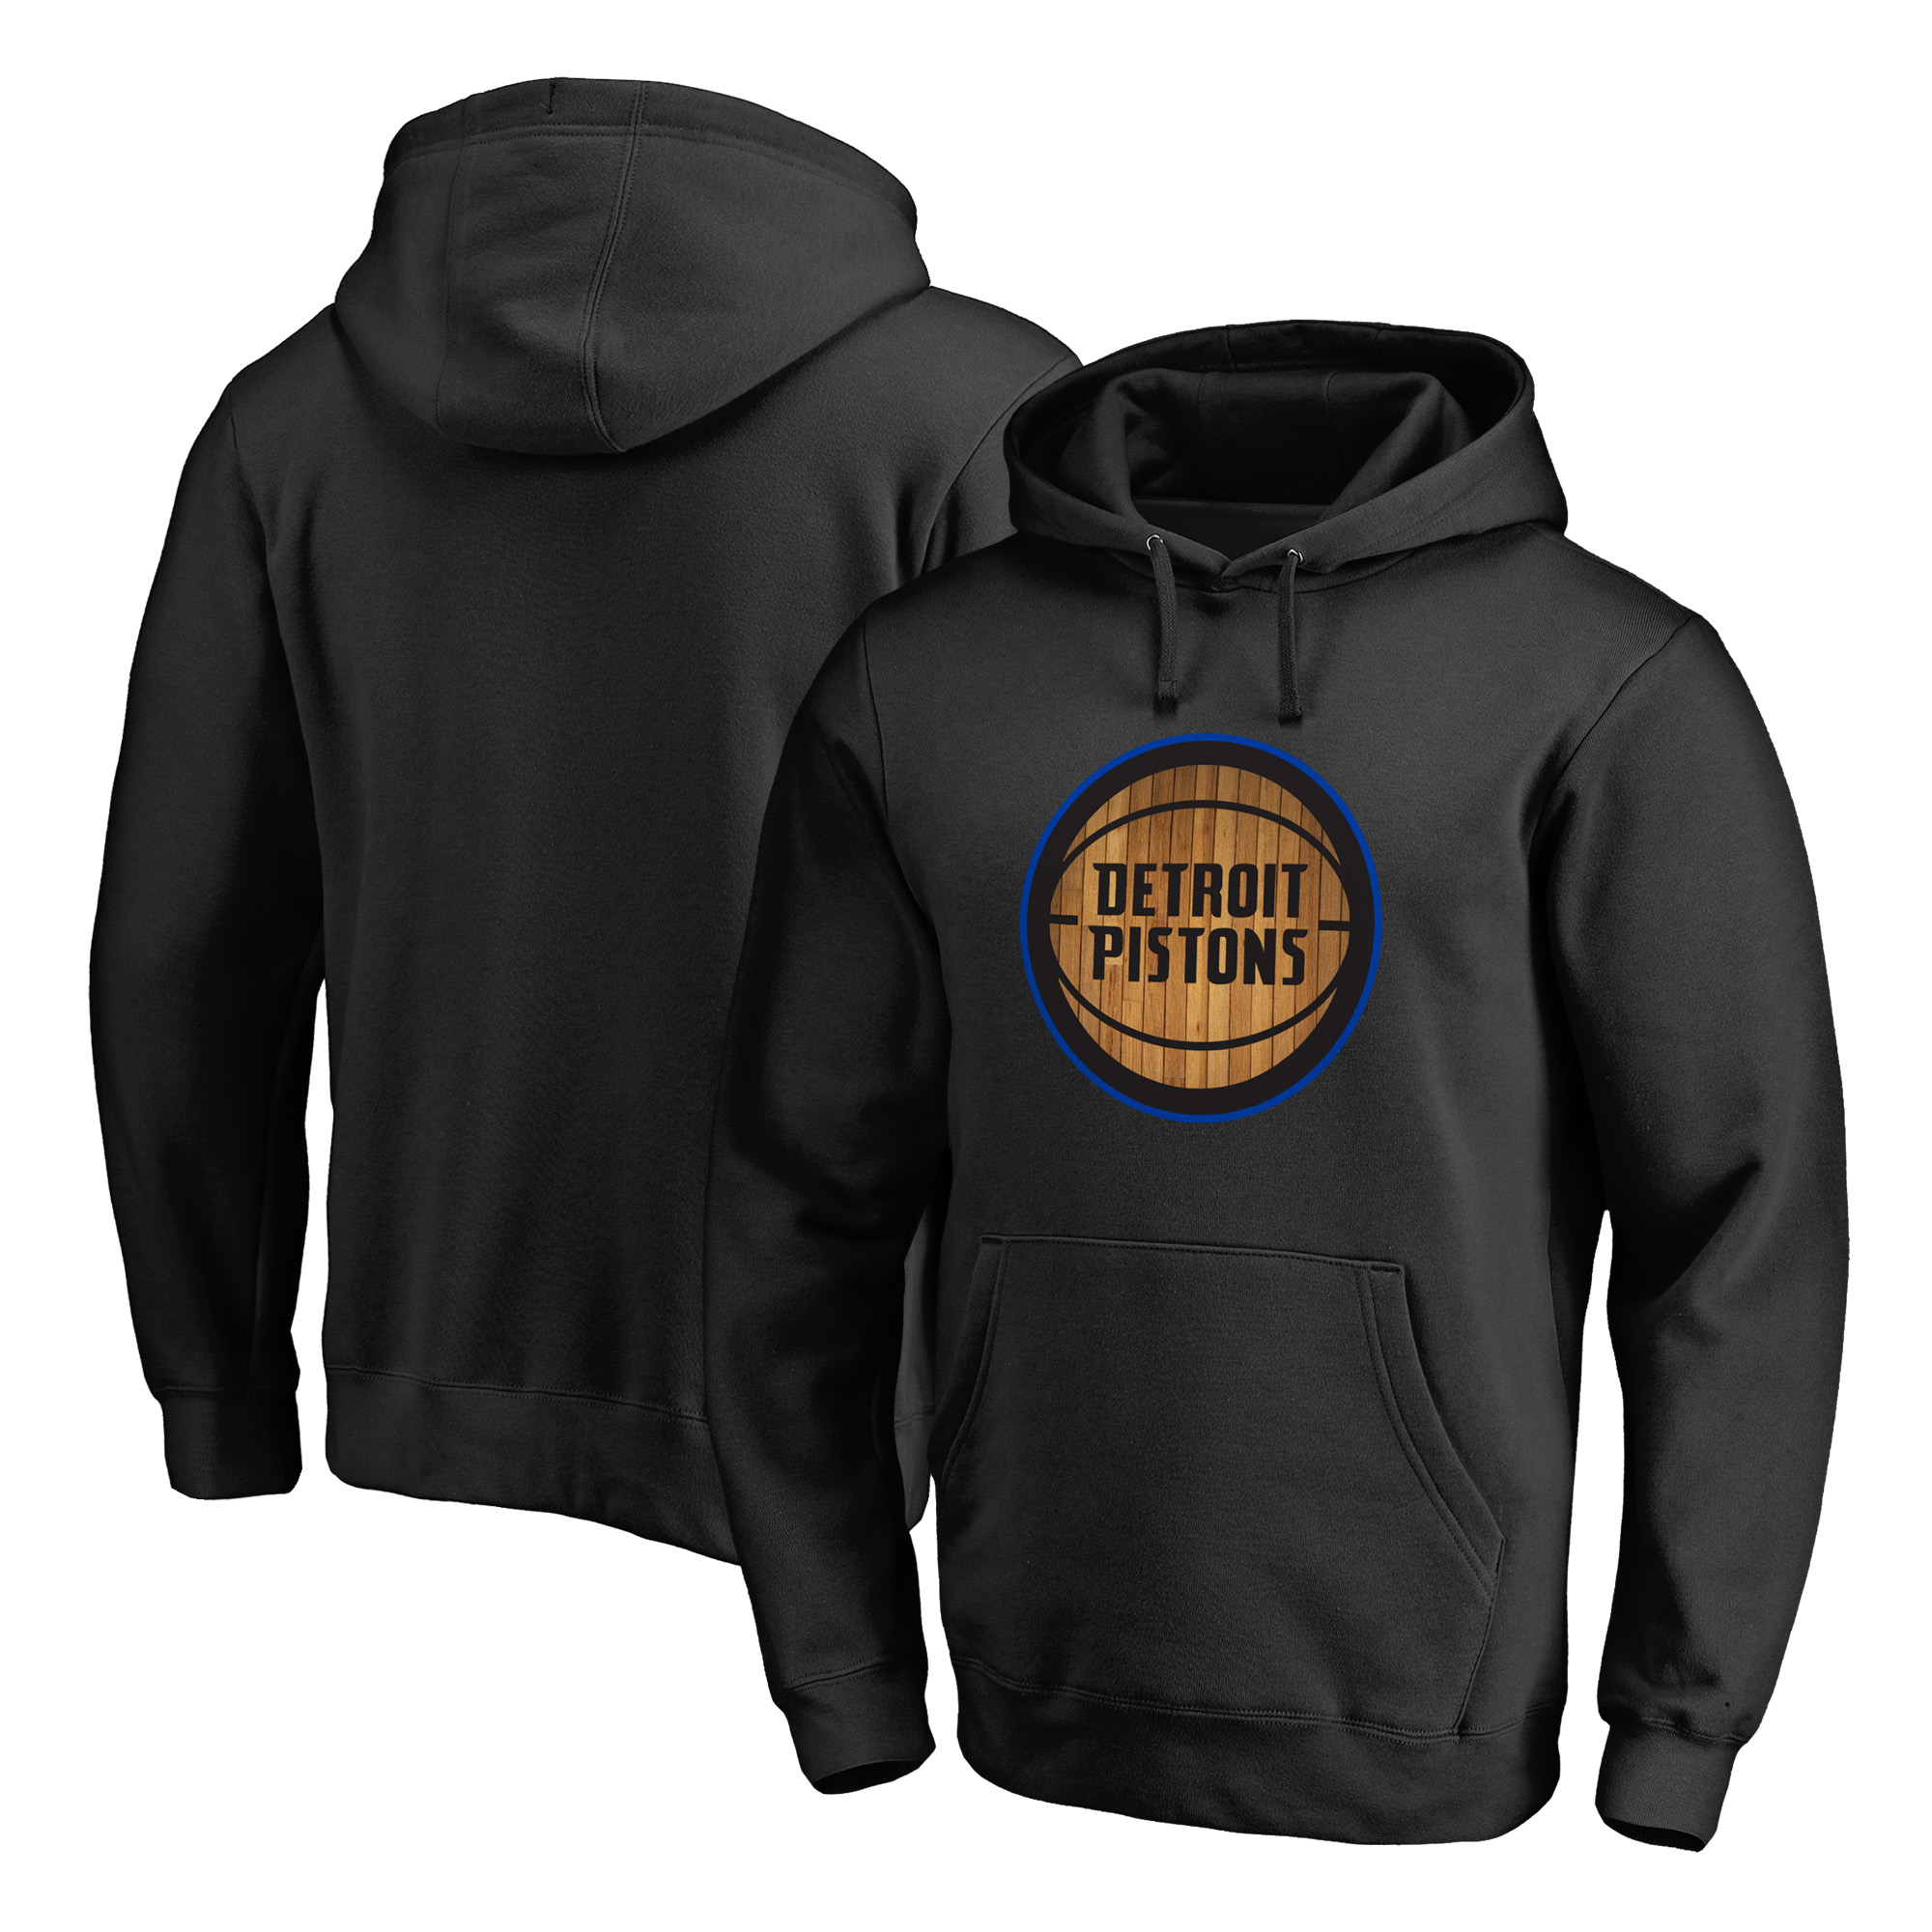 Detroit Pistons Fanatics Branded Hardwood Big & Tall Pullover Hoodie - Black - 4XB